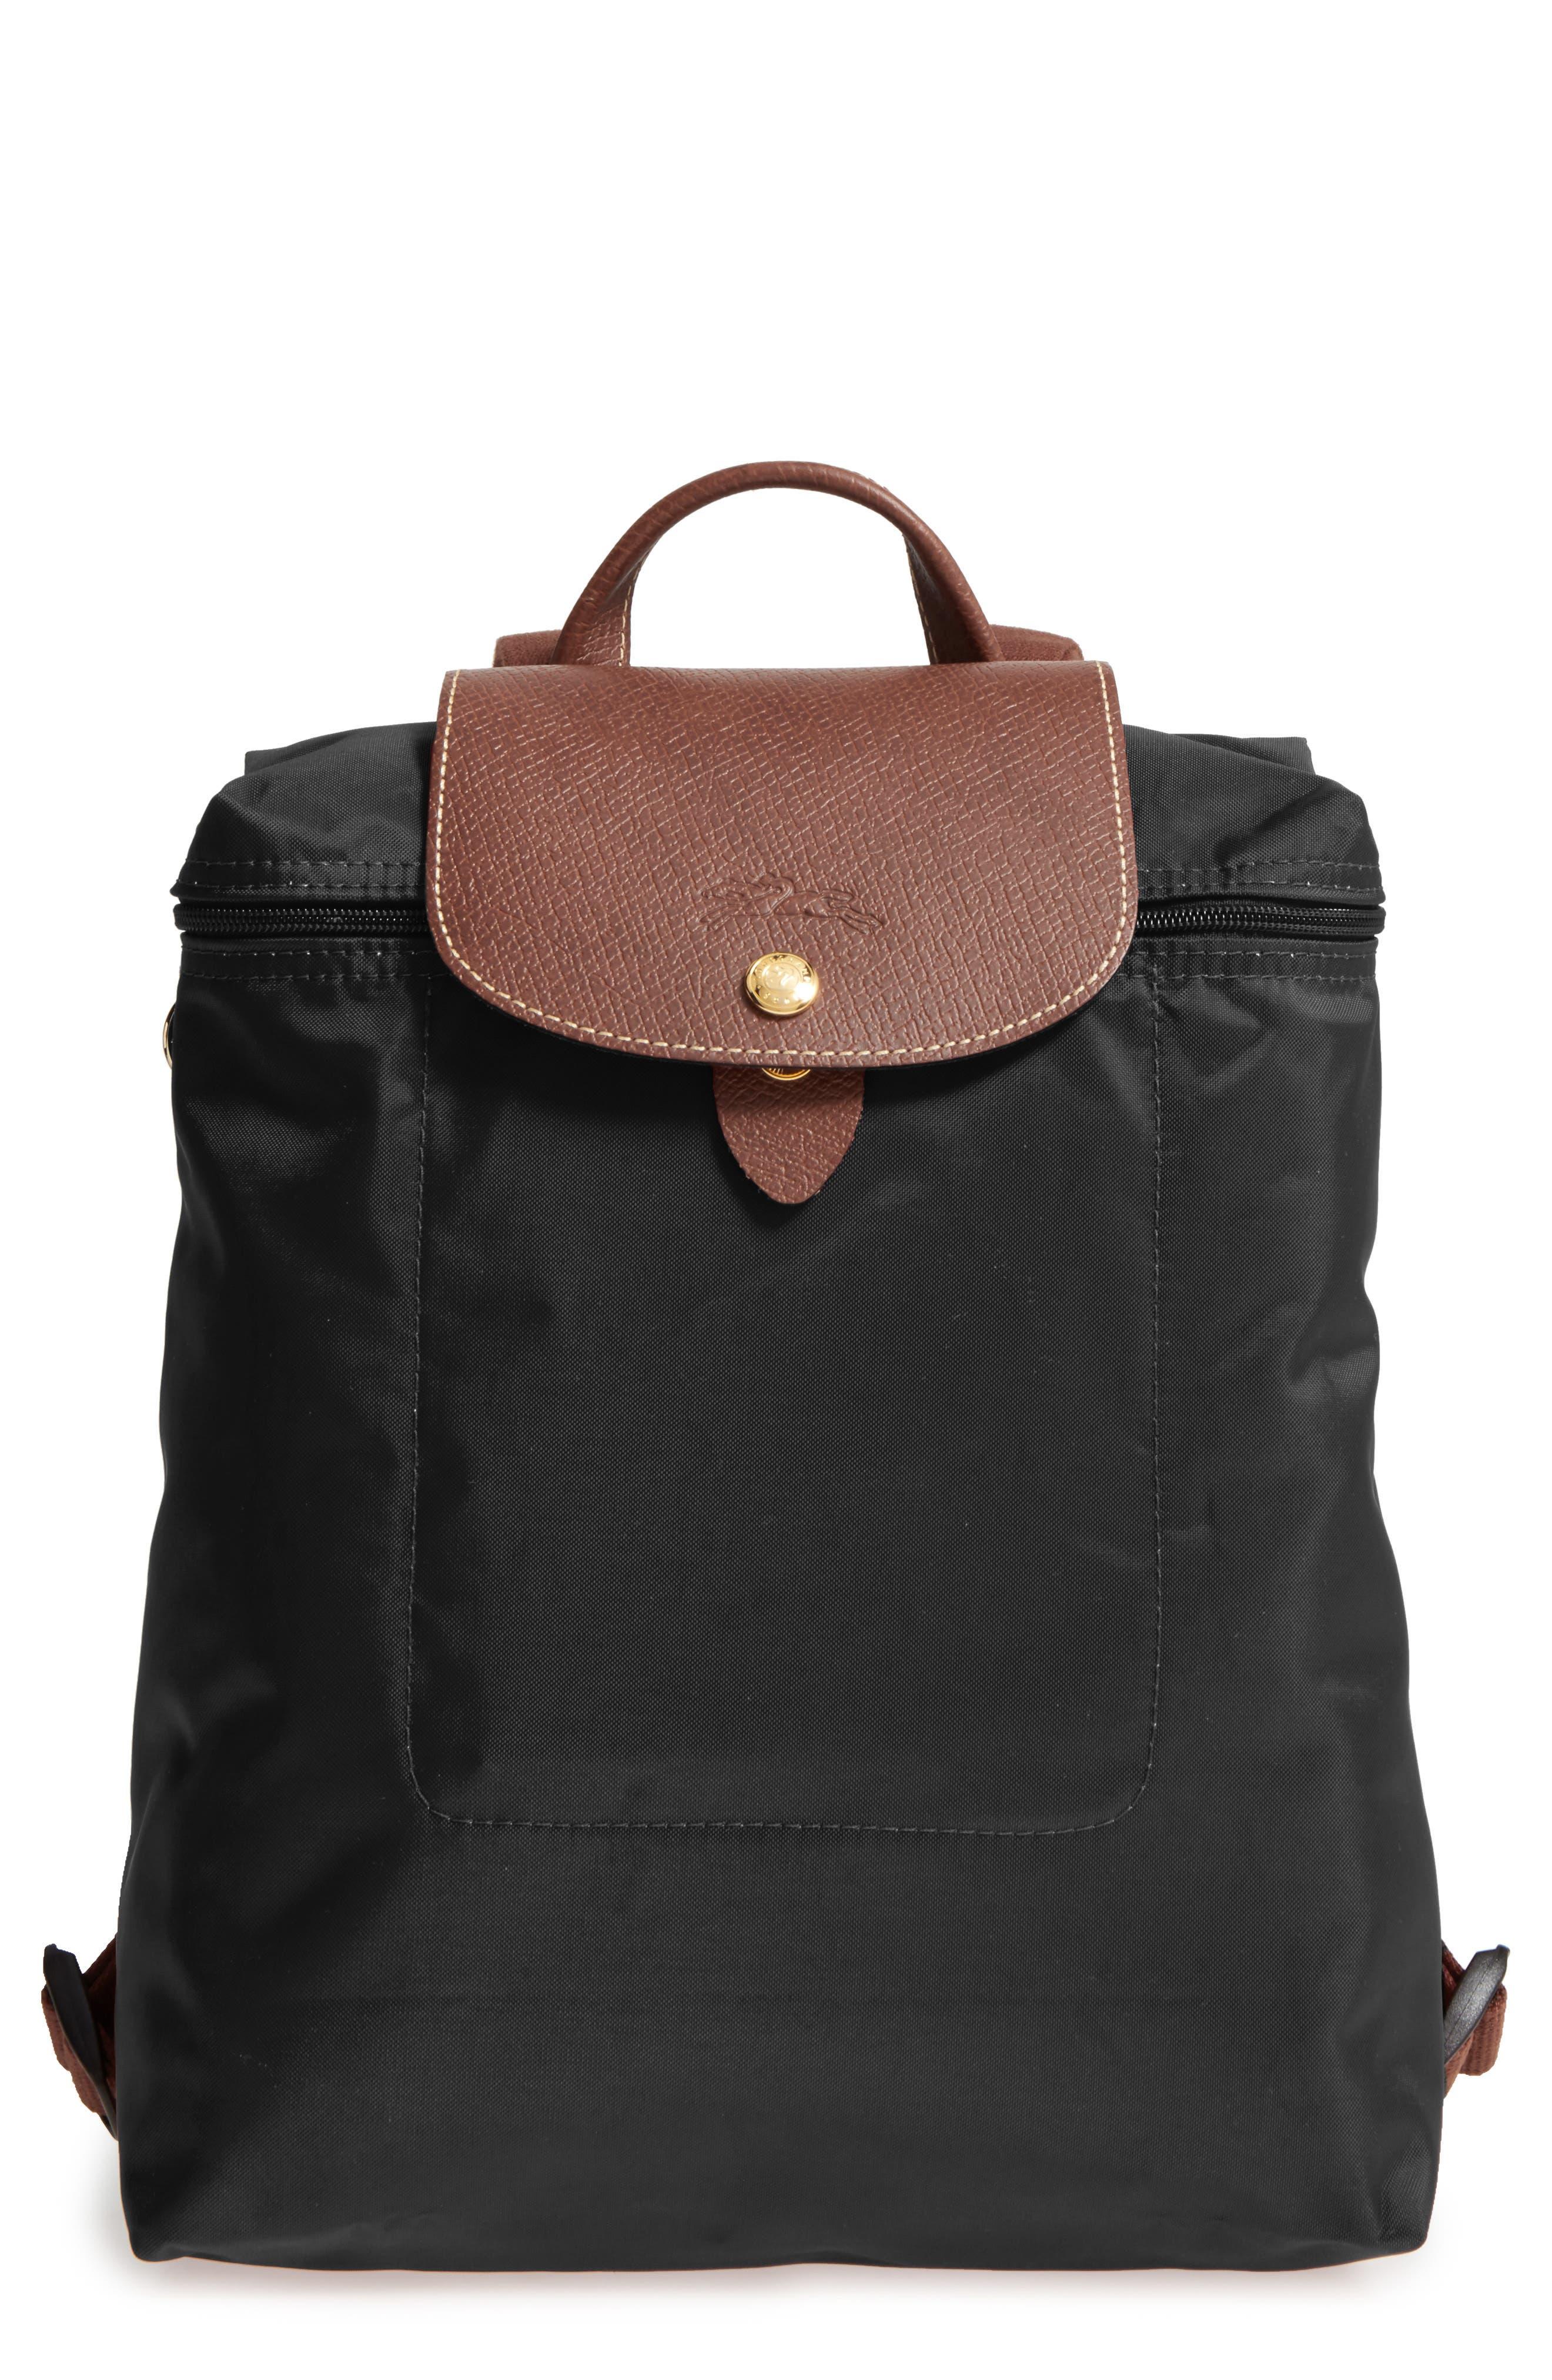 c255be13cb095d Handbags & Wallets for Women | Nordstrom